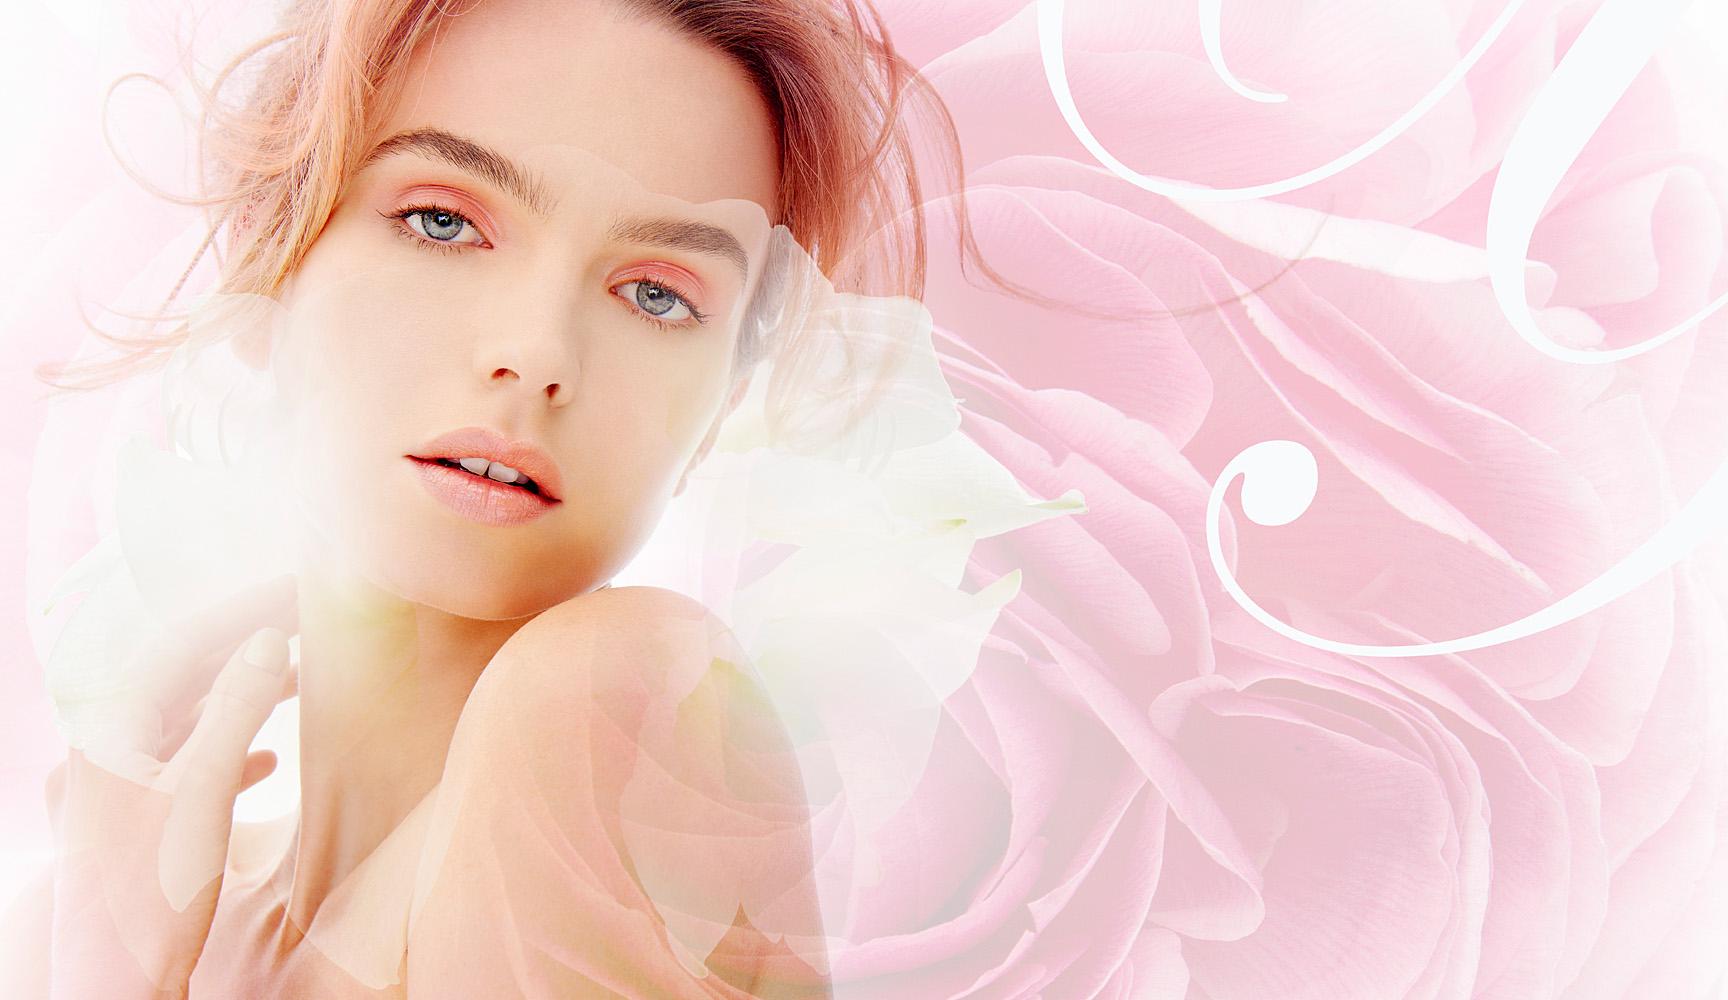 aurelia spring beauty 01.jpg